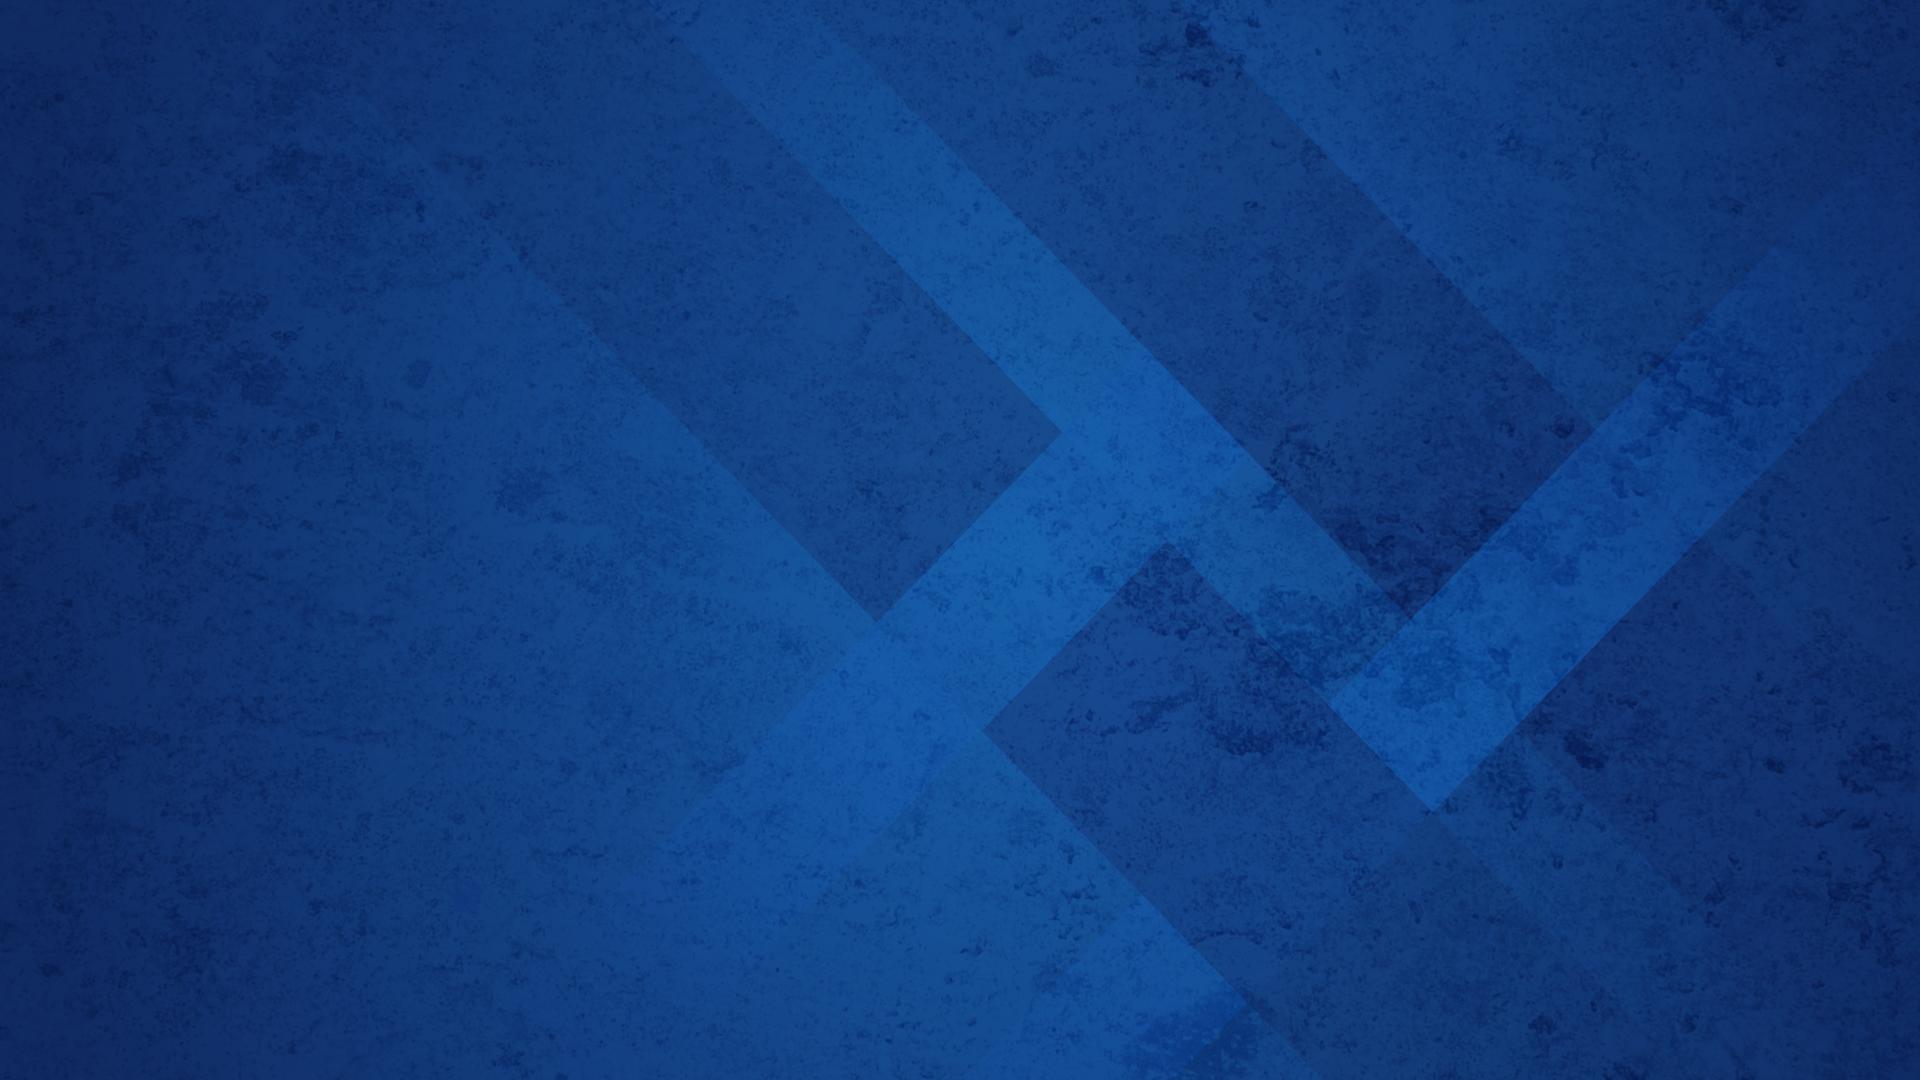 fedora linux desktop wallpaper 51274